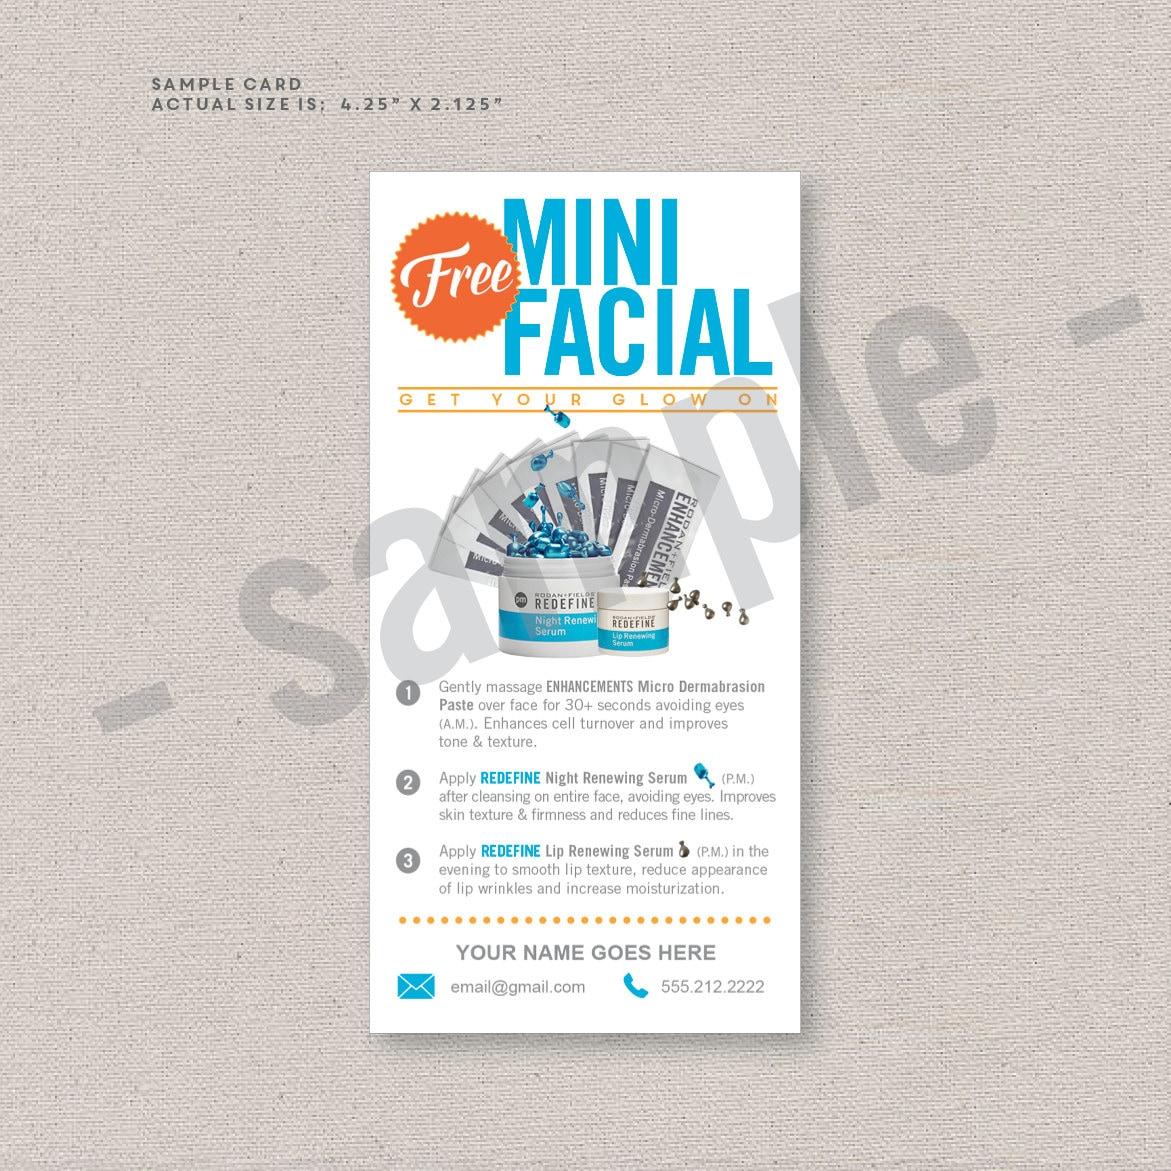 rodan and fields sample cards sample packs mini facial rodan fields inspired editable digital file instant